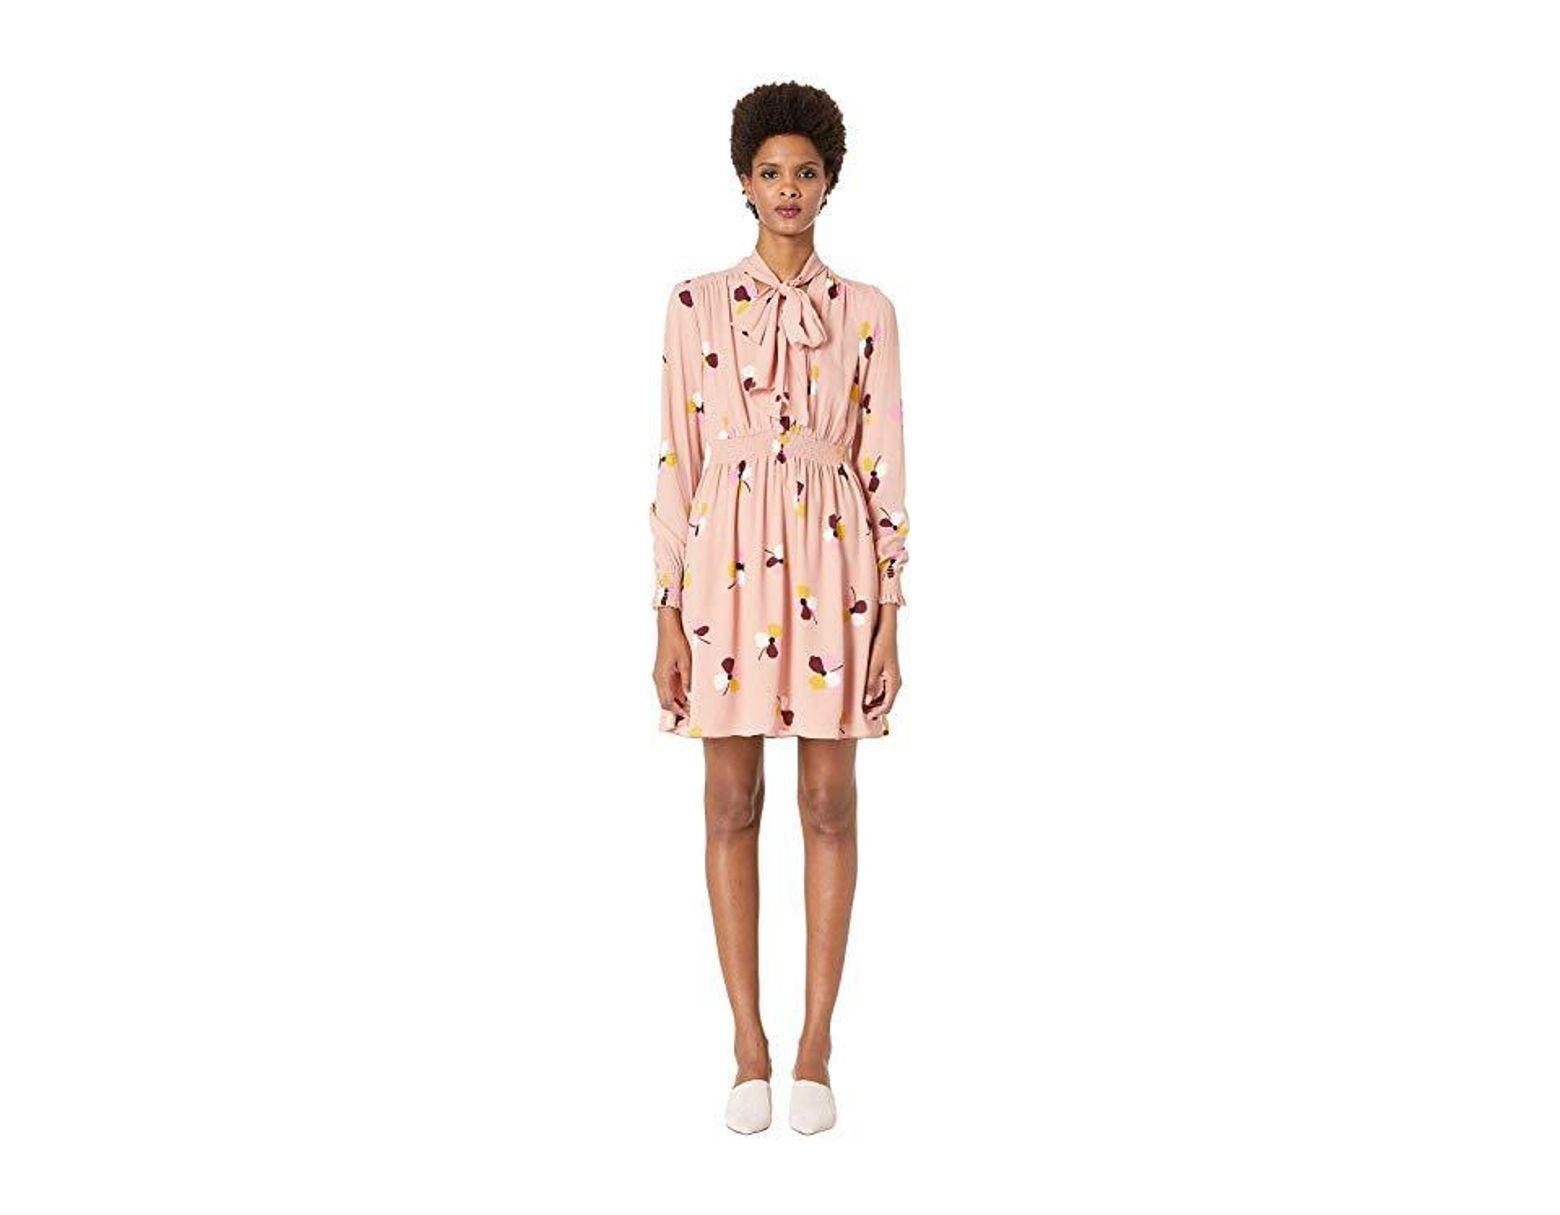 62cad07f9 Kate Spade Dusk Buds Print Mini Dress in Pink - Save 43% - Lyst